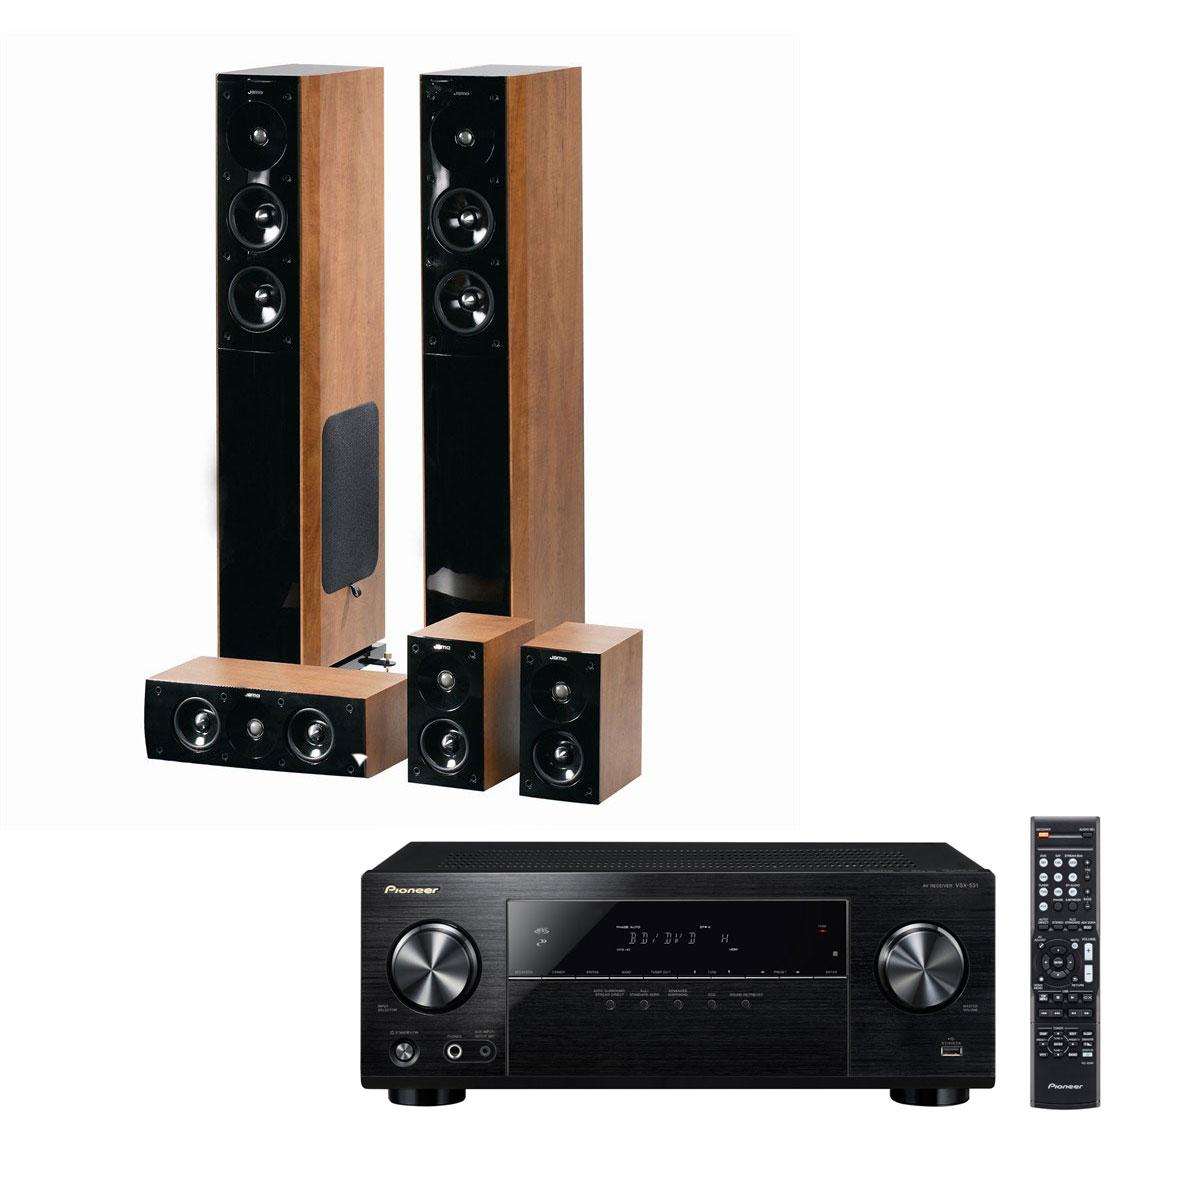 Ensemble home cinéma Pioneer VSX-531B + Jamo S 606 HCS 3 Dark Apple Ampli-tuner Home Cinéma 5.1 Bluetooth, HDCP 2.2, et Upscaling Ultra HD 4K avec 4 entrées HDMI + Pack d'enceintes 5.0